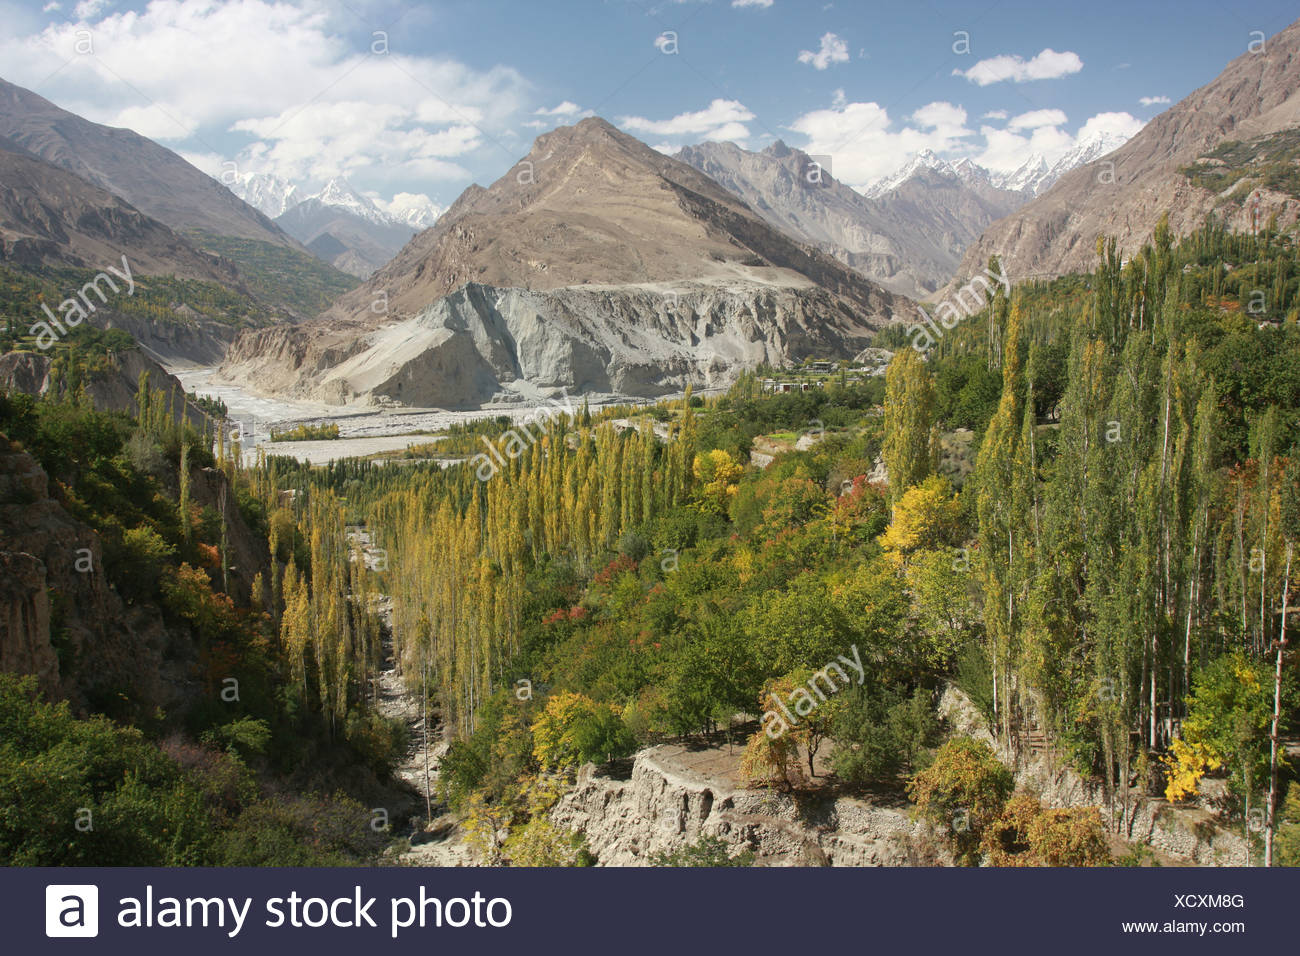 Hunza, Hunza-Valley, Karakoram, Karakoram-Highway, Pakistan, Asia, silk-road, Hindukush, Shangri-la, Hunzakut, Karimabad, Altit - Stock Image